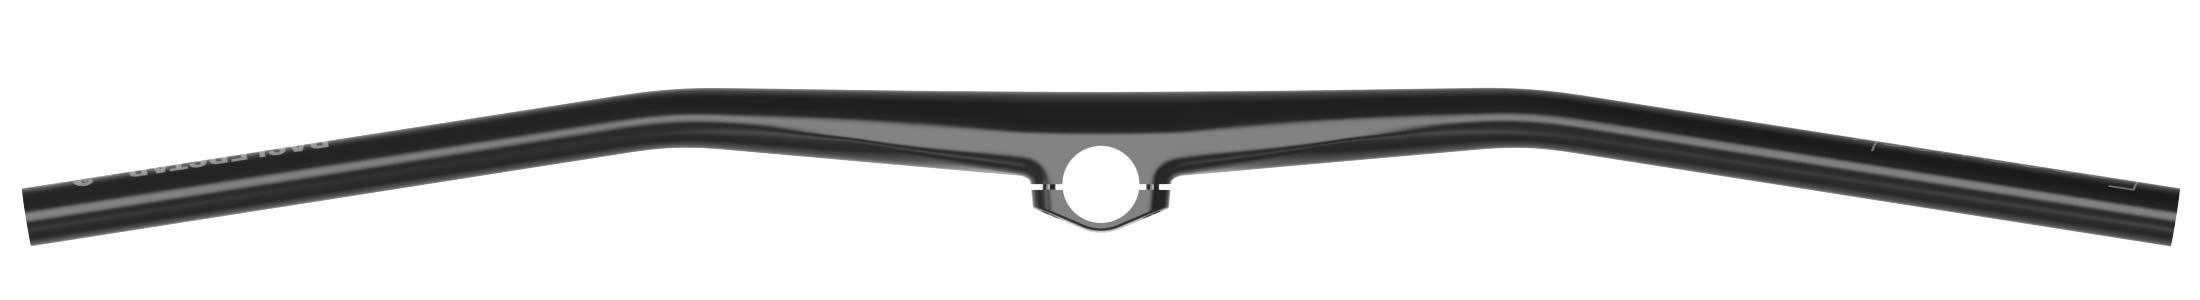 Faserwerk Baslerstab direct-mount lightweight carbon MTB handlebar, top